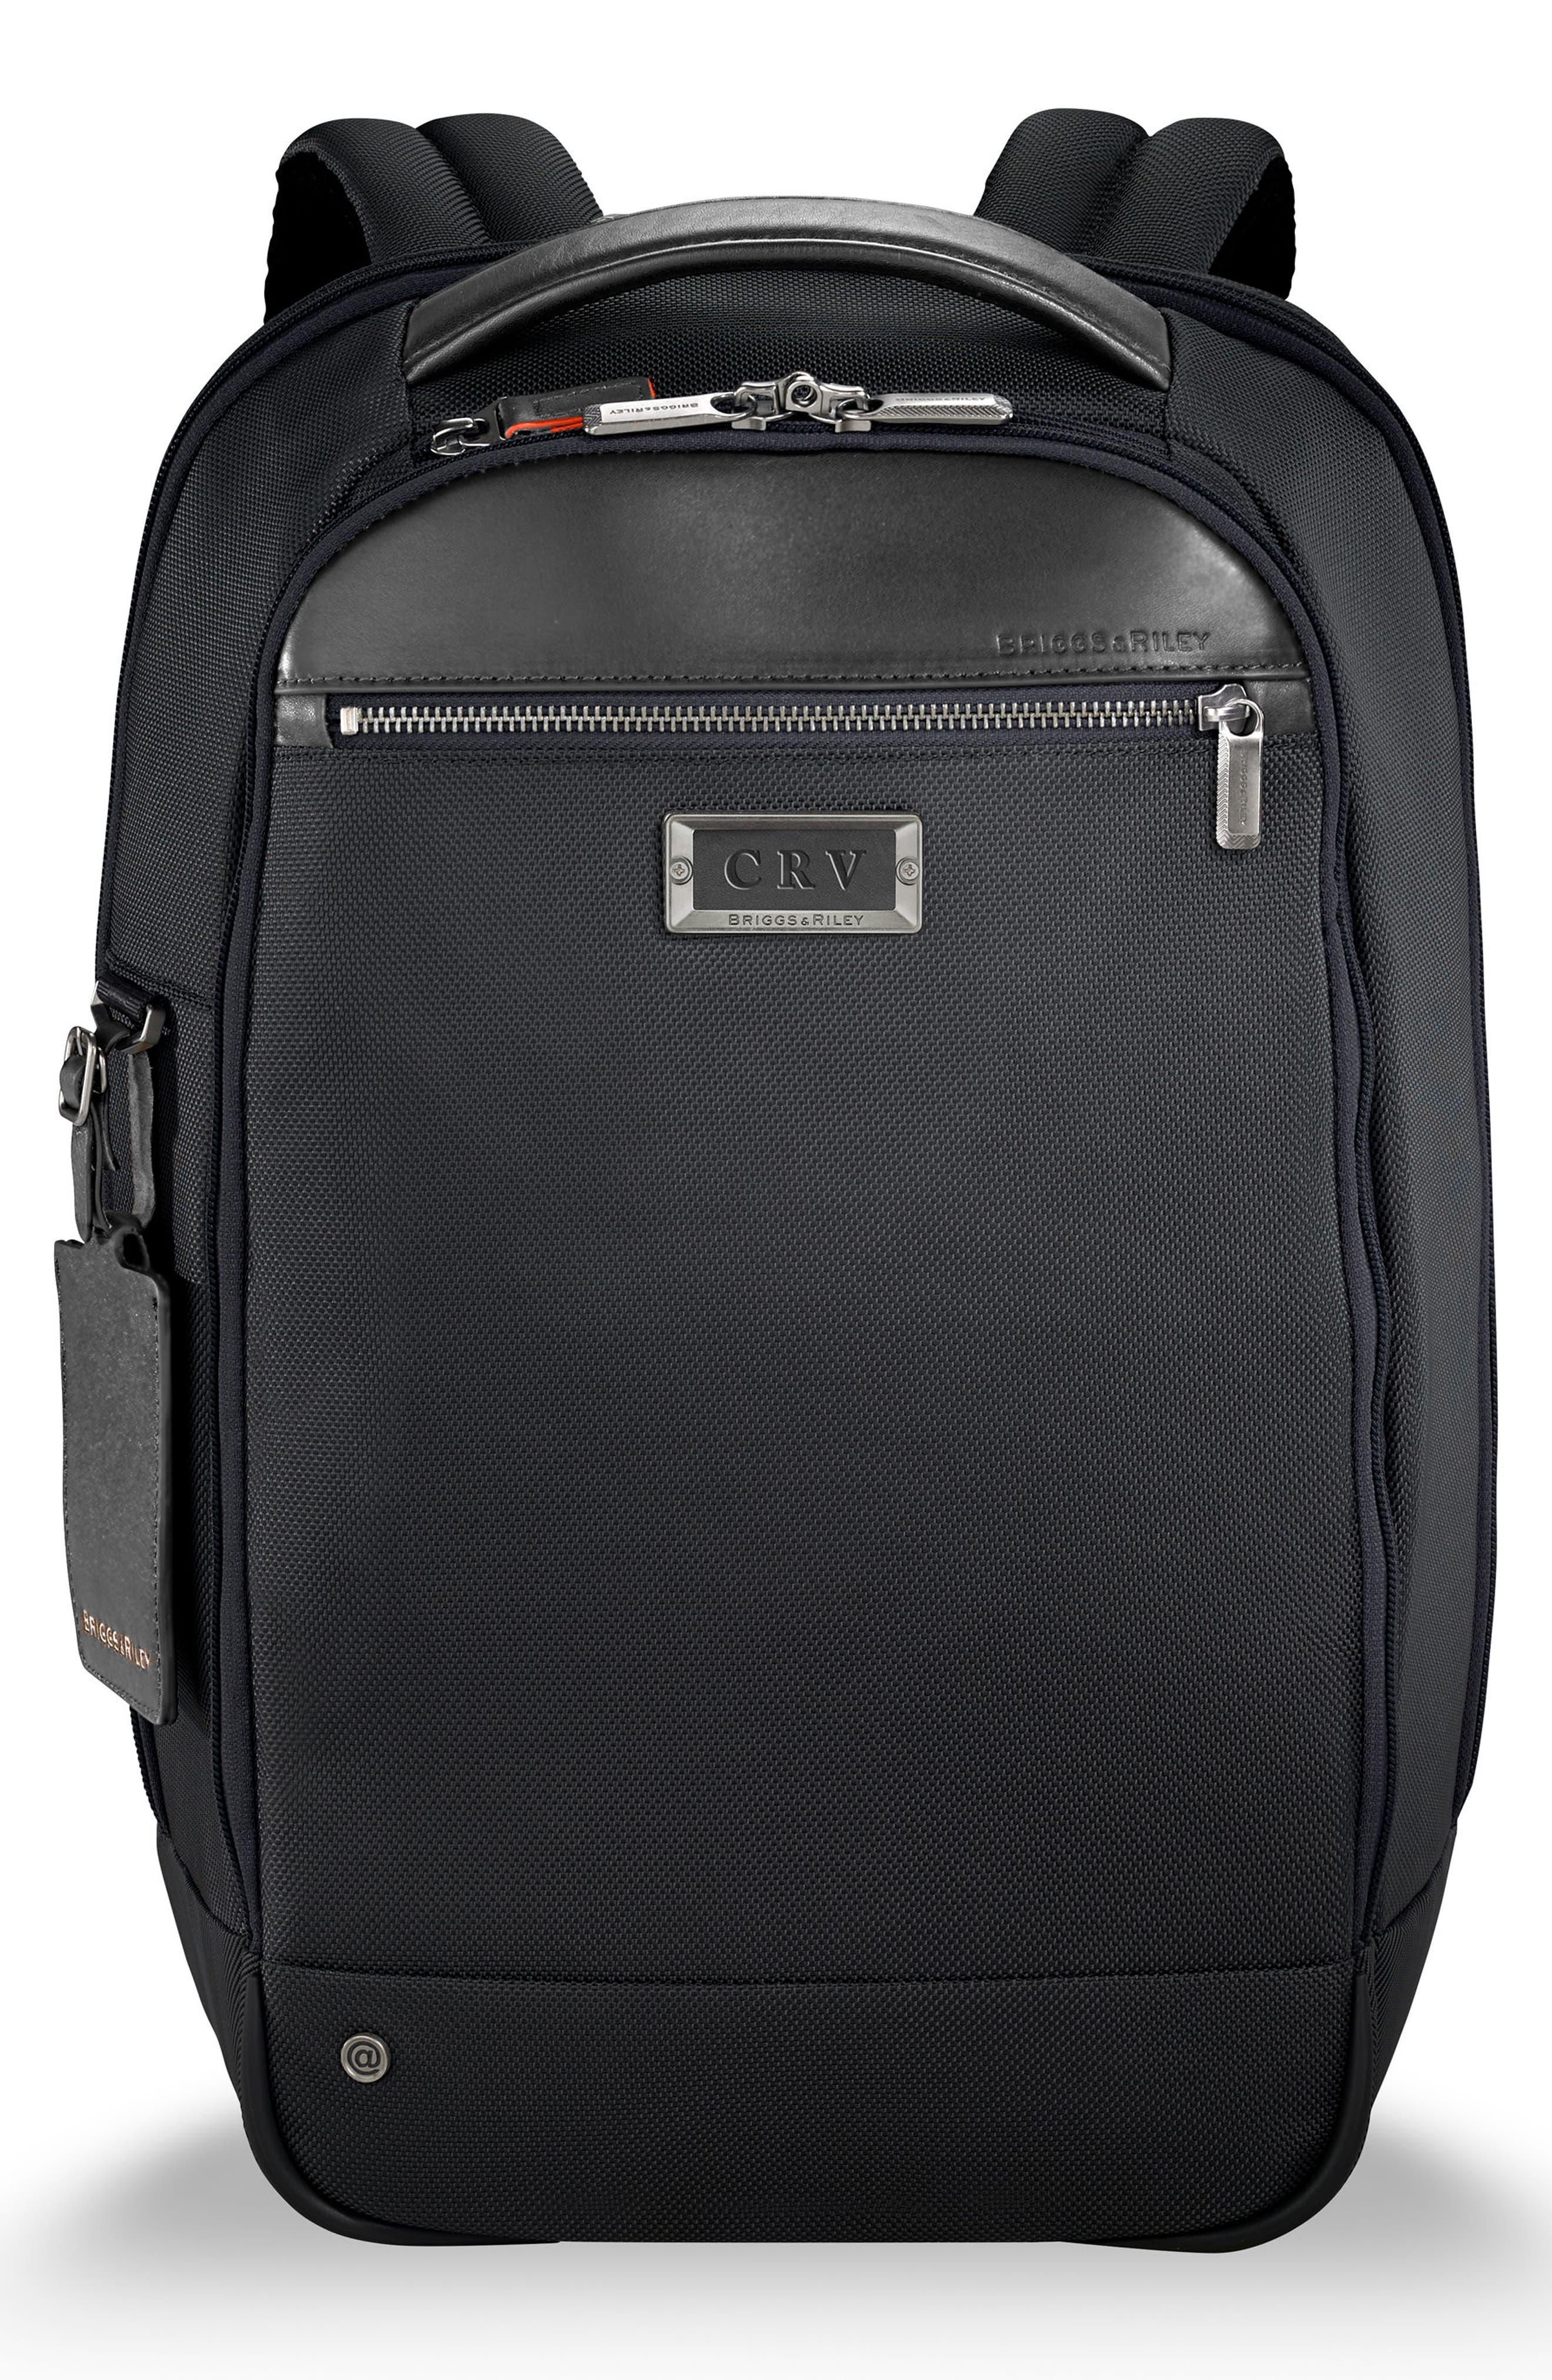 BRIGGS & RILEY,                             @work Medium Slim Backpack,                             Main thumbnail 1, color,                             NO_COLOR